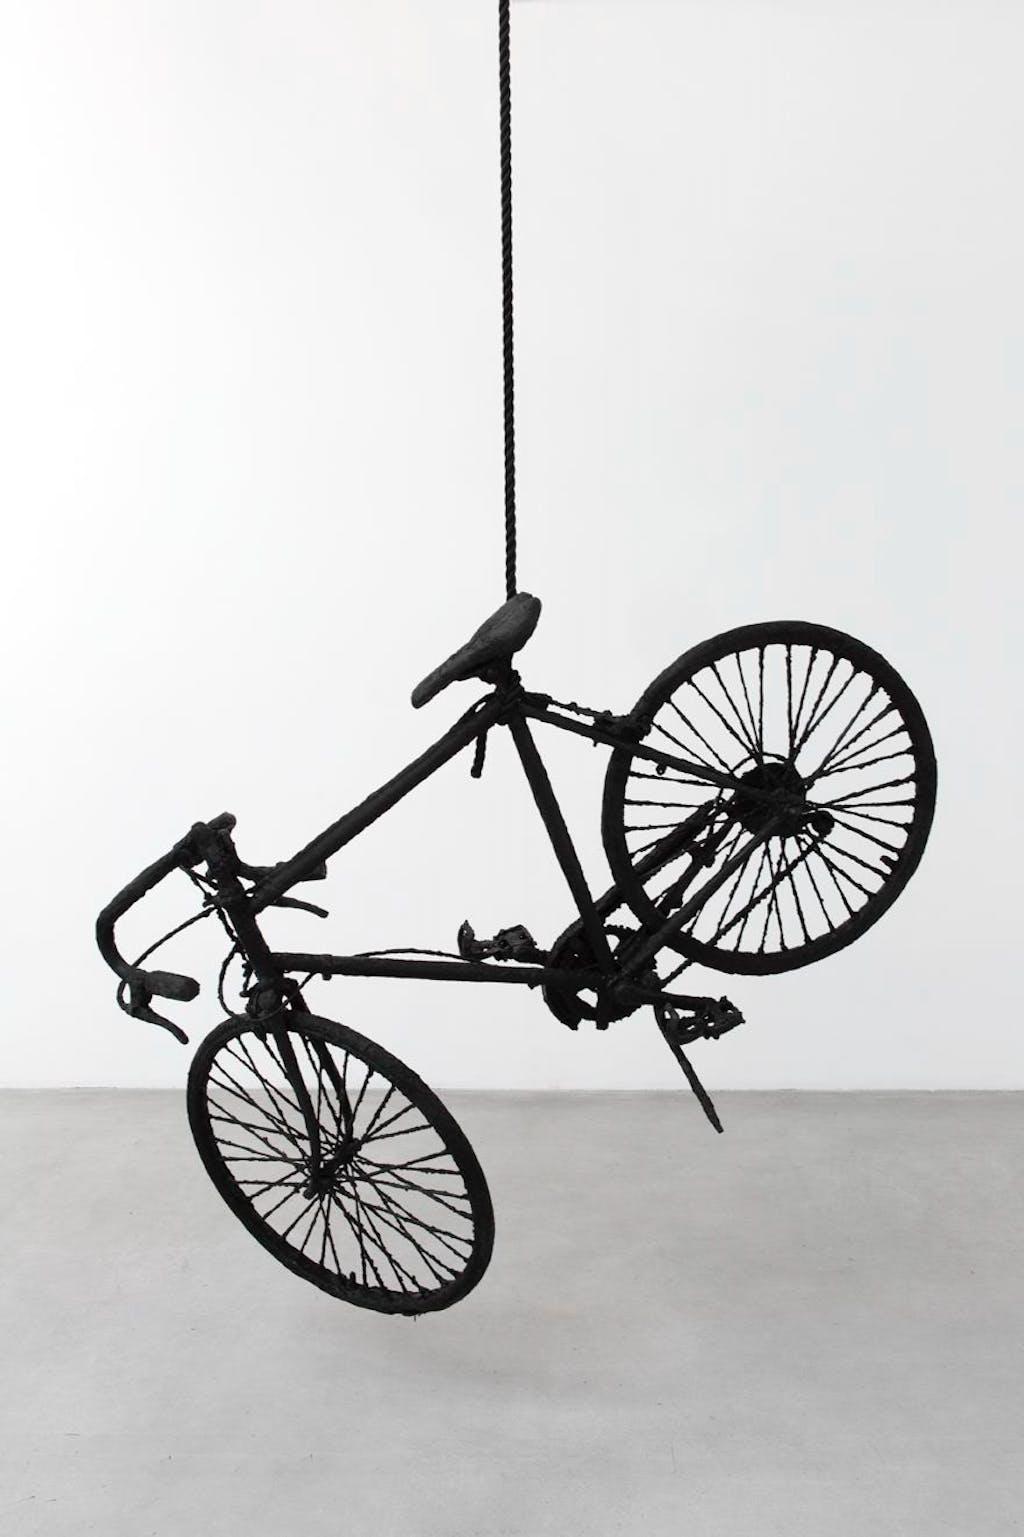 Untitled / Bicycle - © kamel mennour